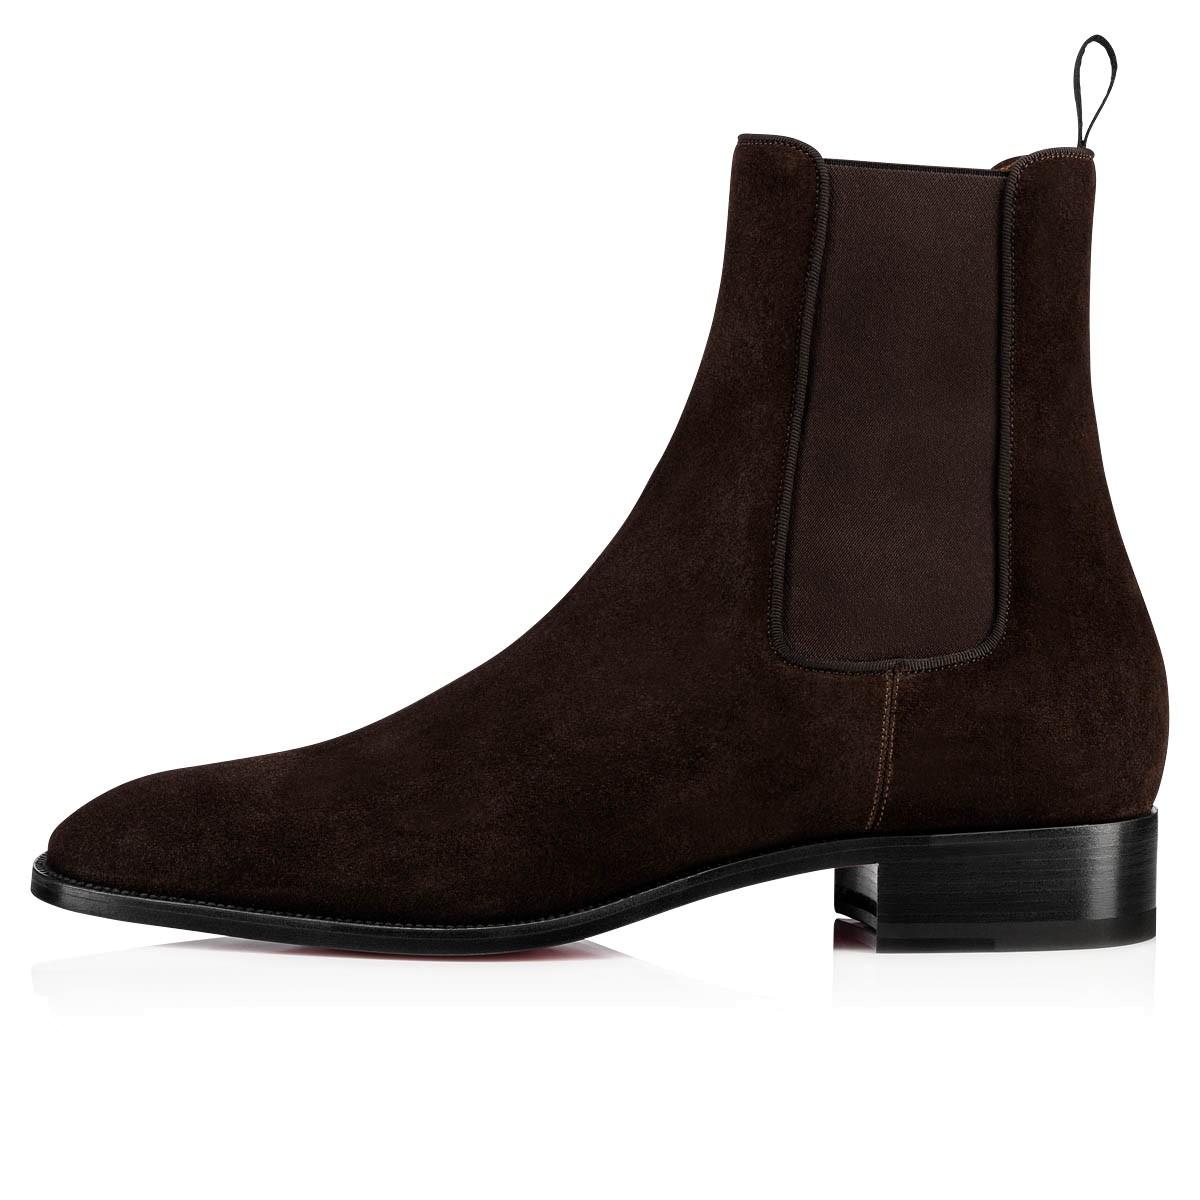 Shoes - Samson Orlato - Christian Louboutin